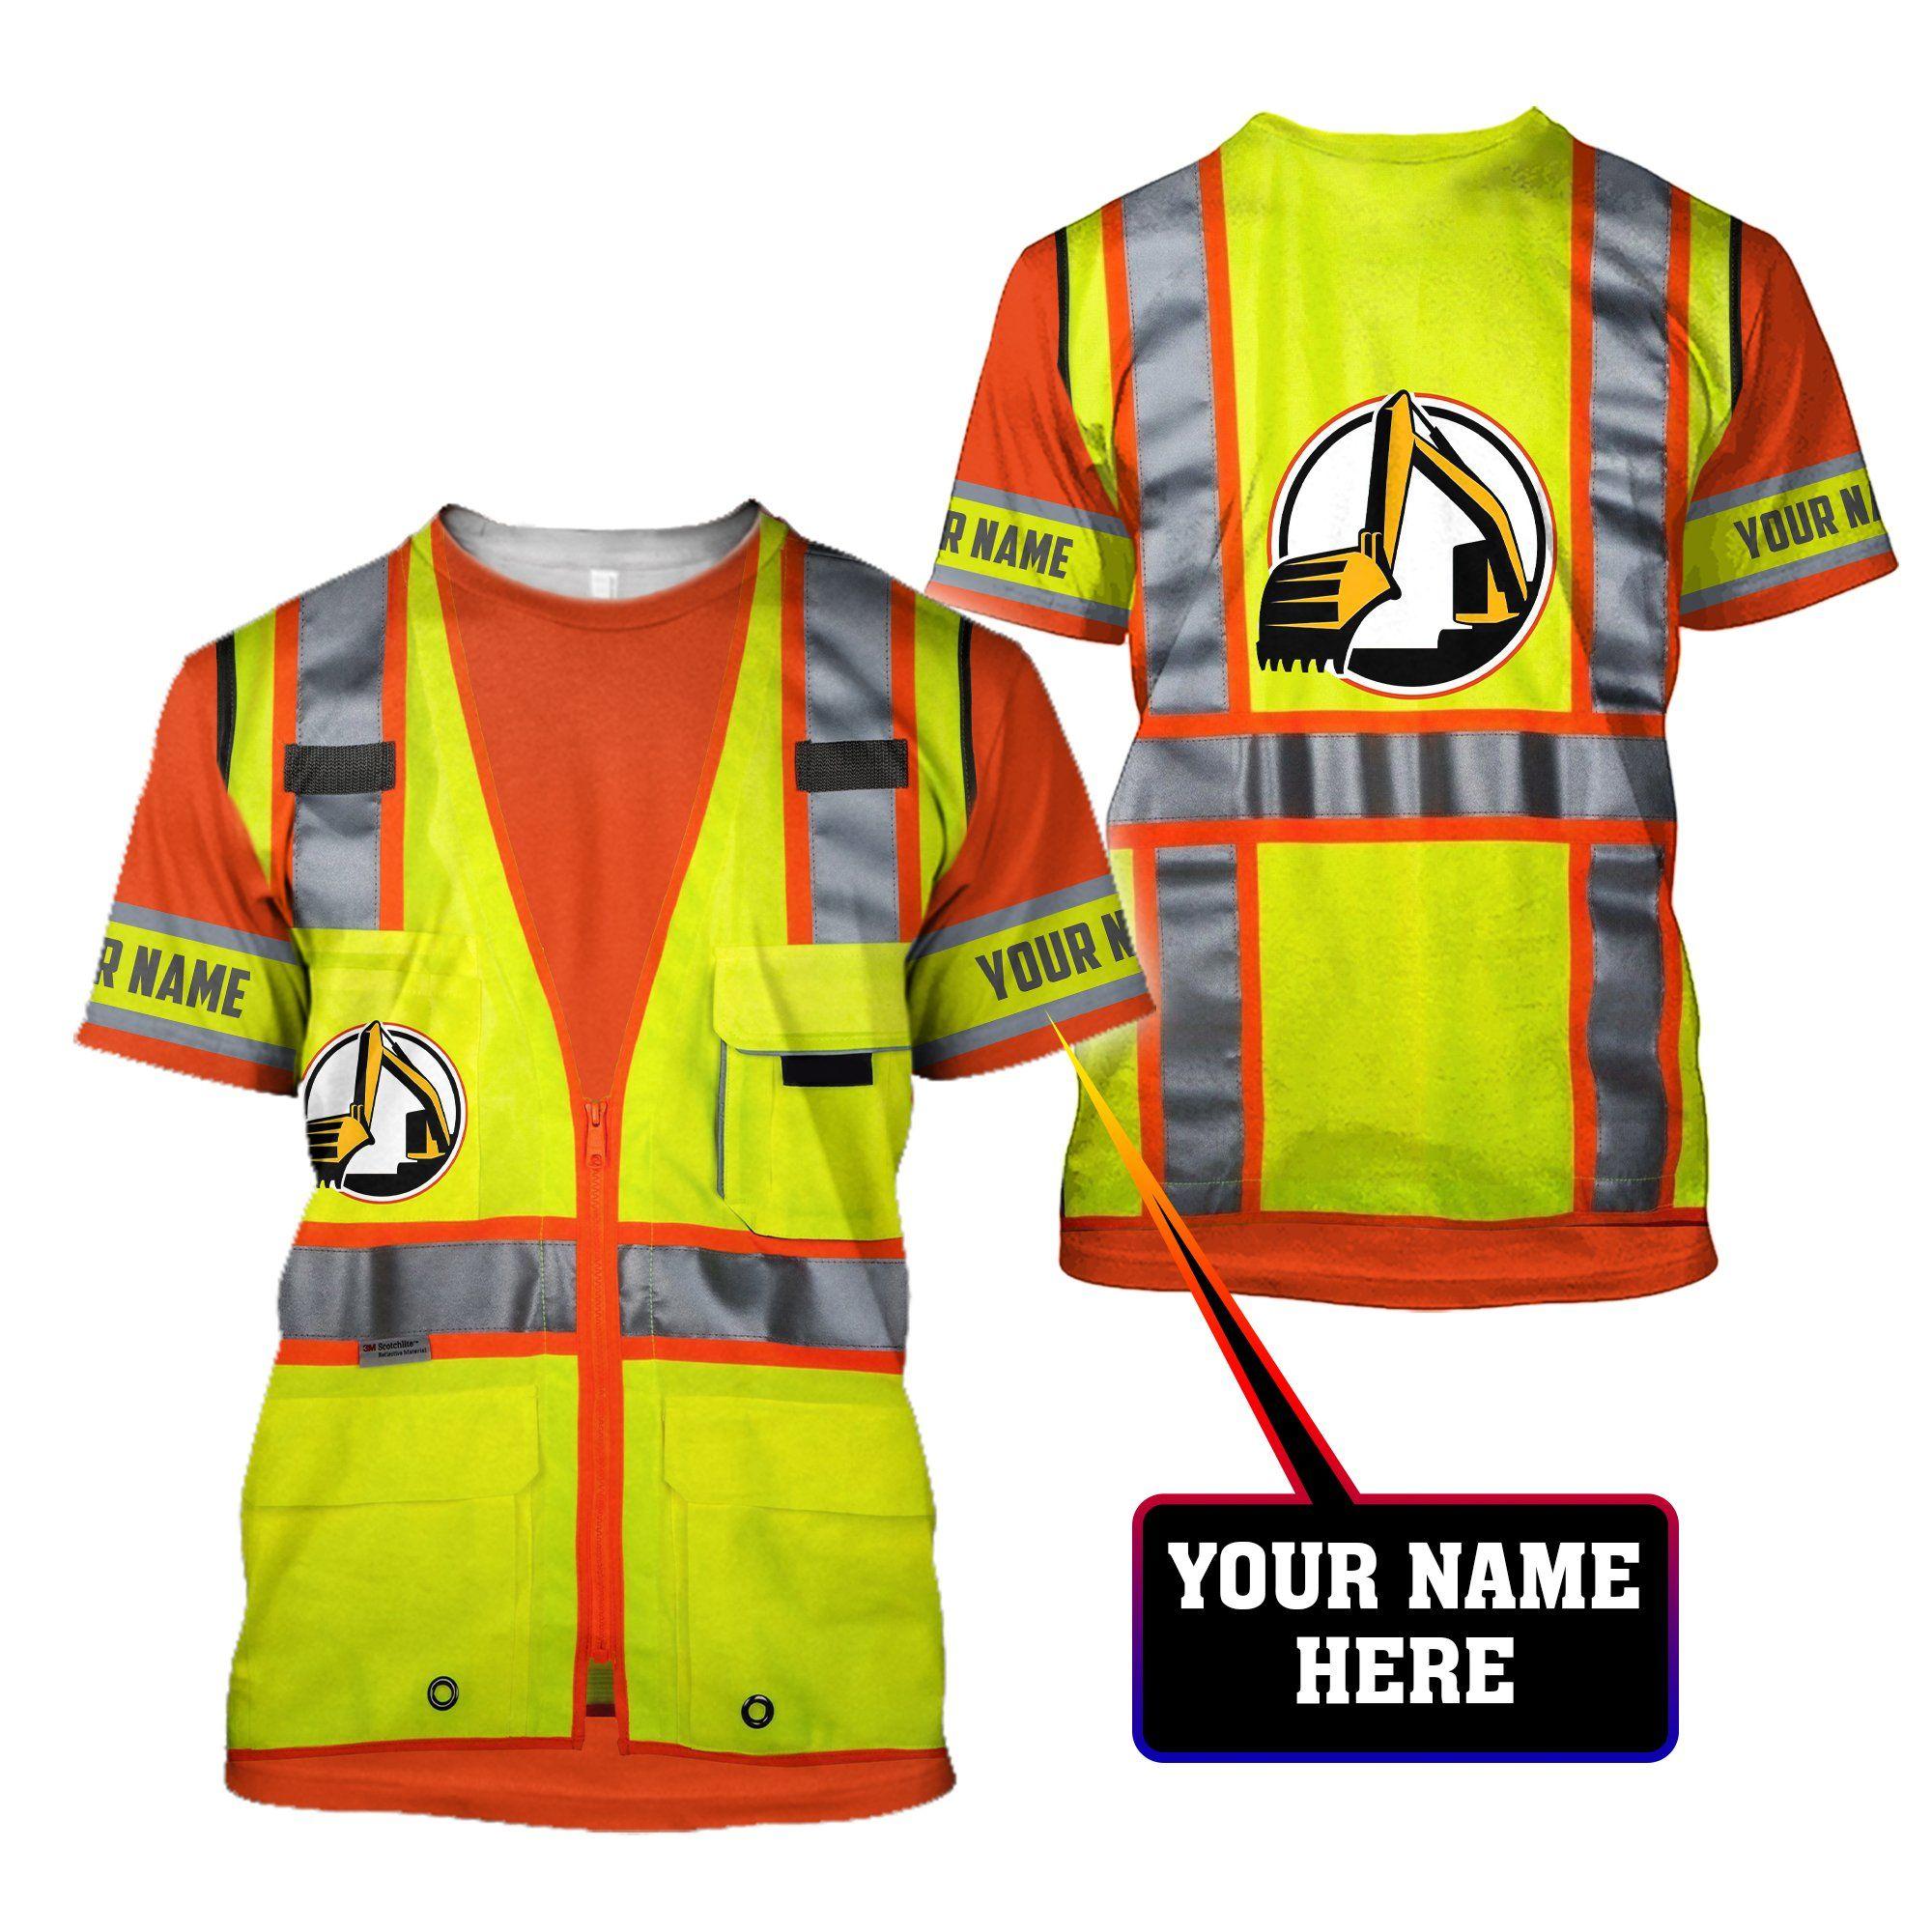 Excavator Shirts Pi23062105 - T-shirt / 3XL